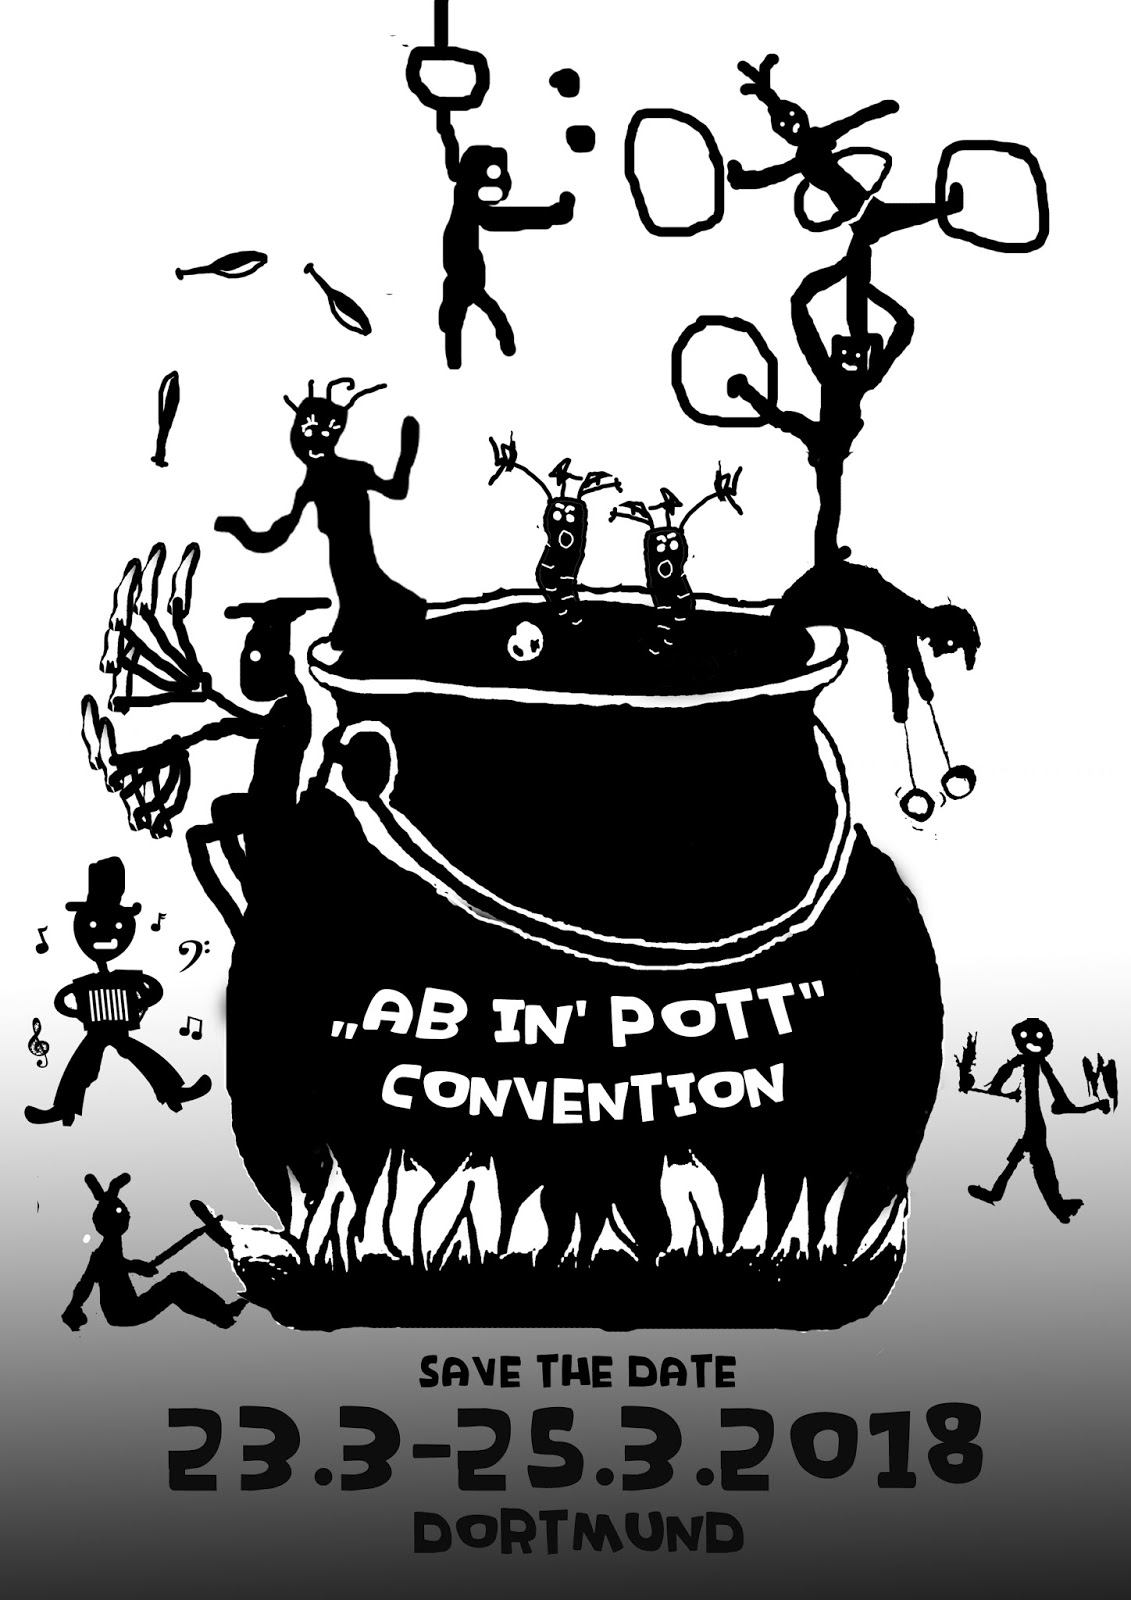 Evil Flames Feuerworkshops Ab In Pott Convention